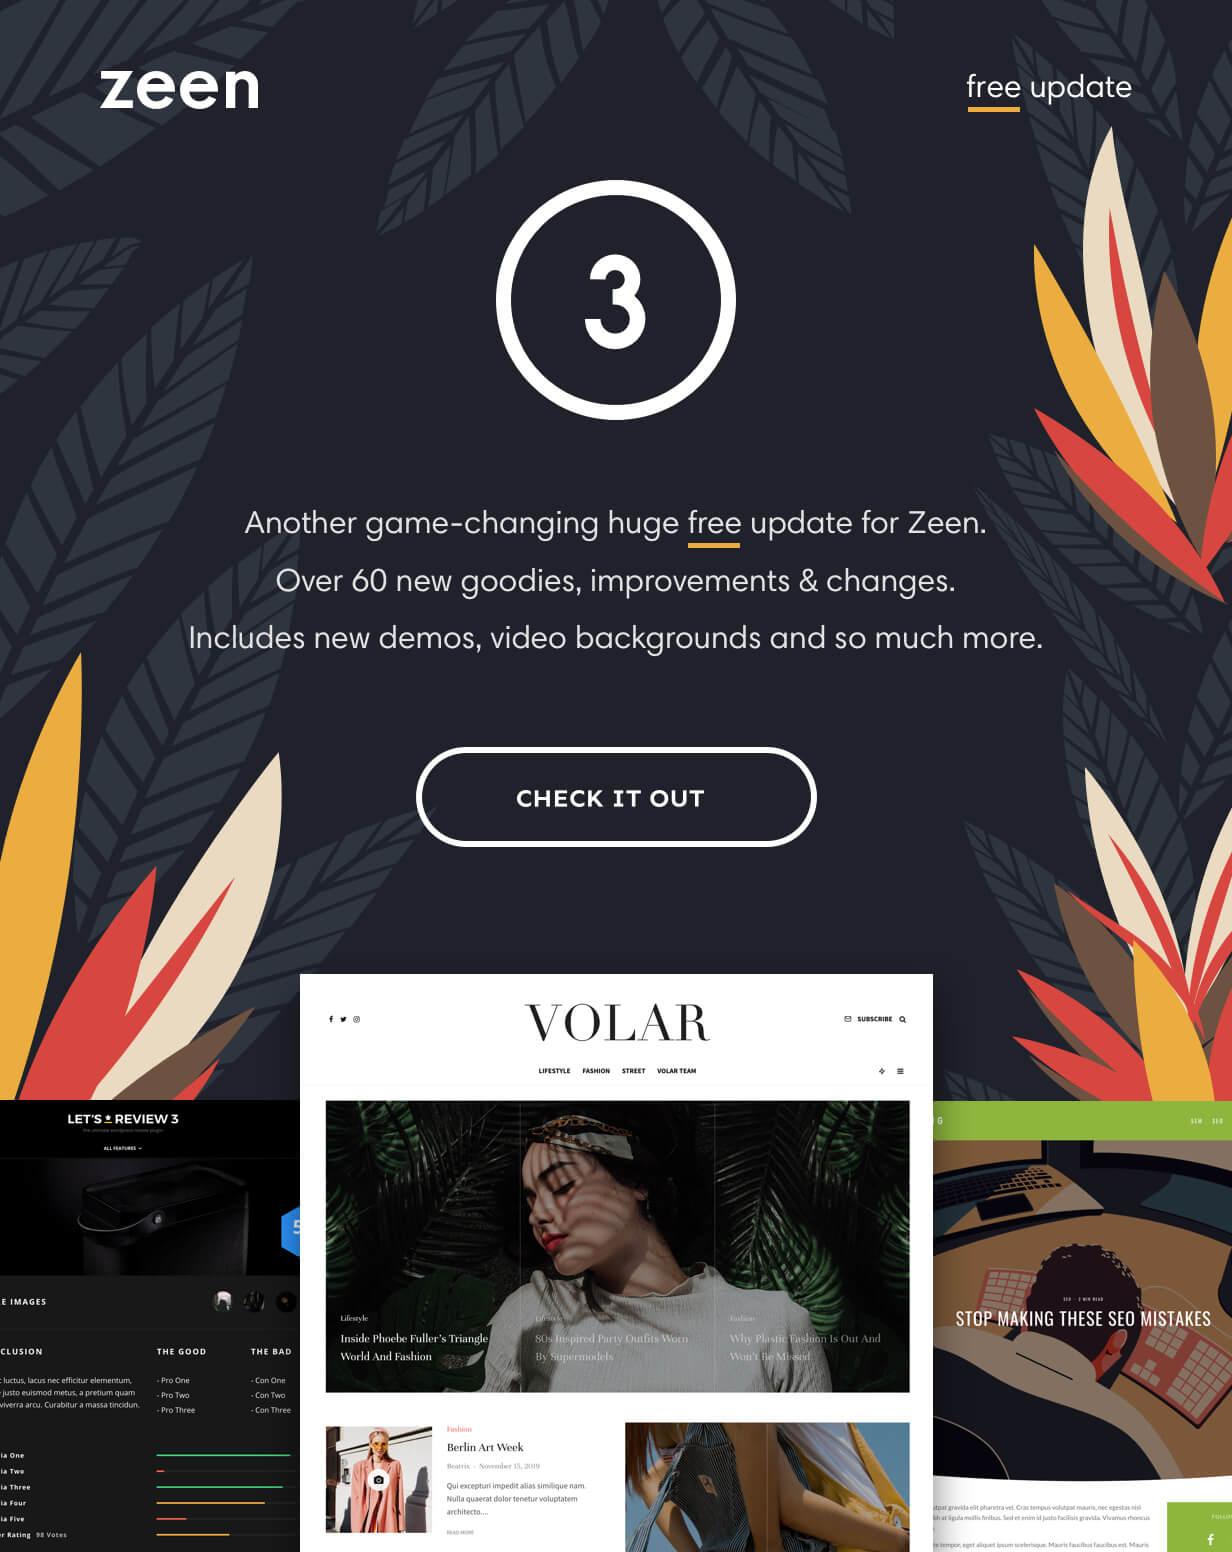 news wordpress theme 2020 - Zeen | Next Generation Magazine WordPress Theme